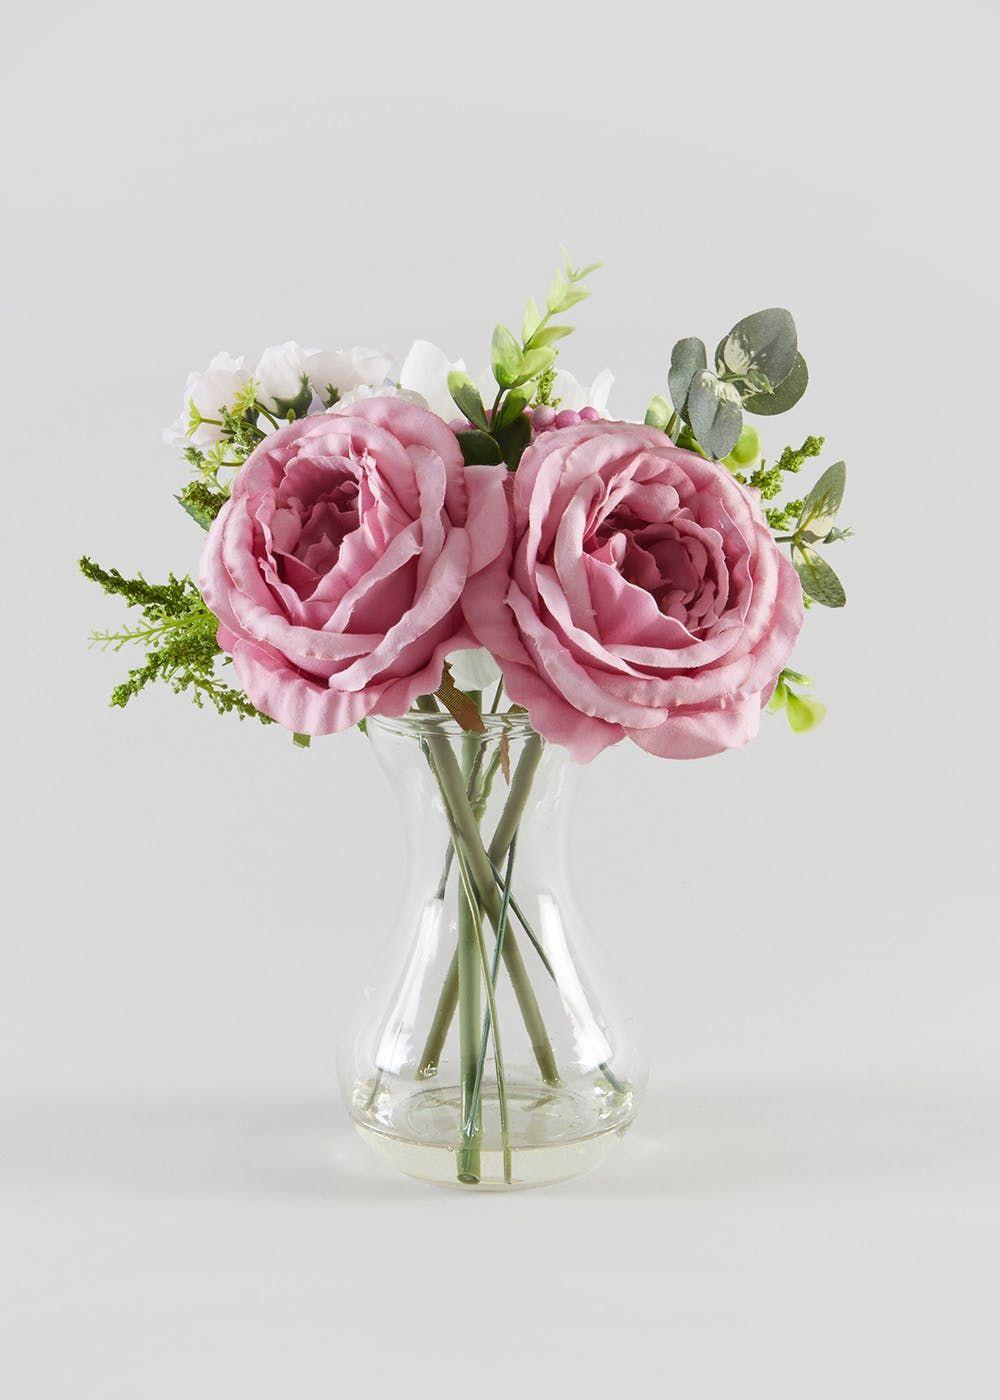 Pinterest & Floral Arrangement in Glass Vase (25cm x 20cm x 20cm) in ...